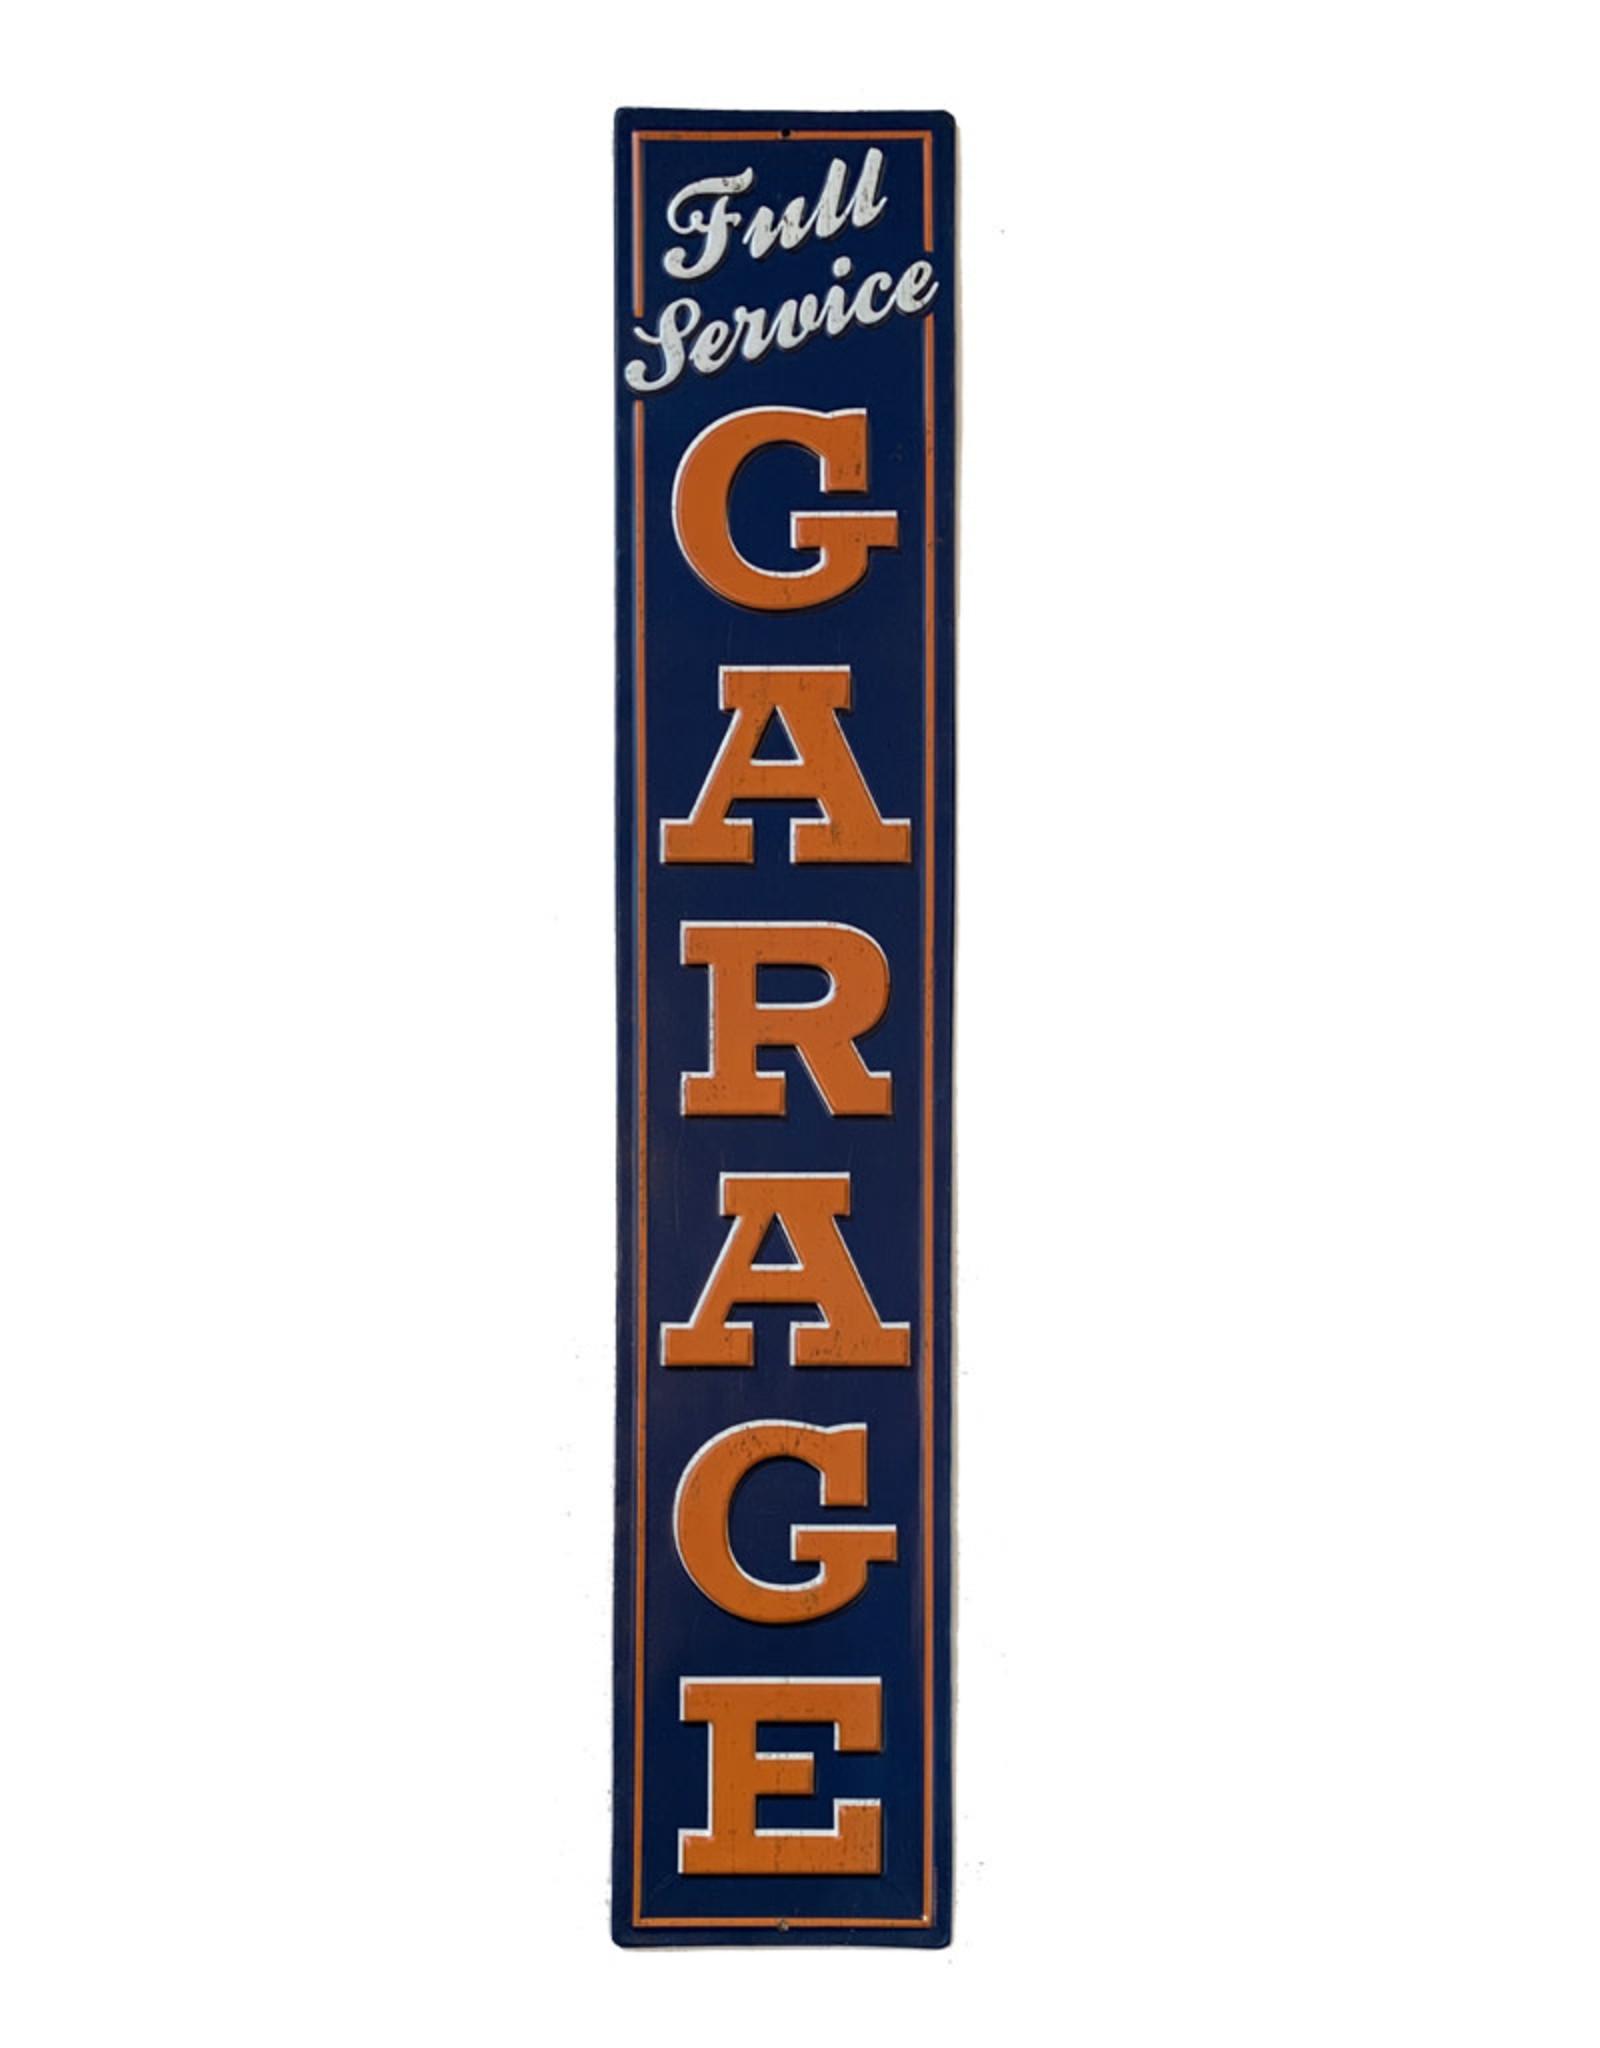 Full Service Garage ( Embossed Metal Plate )